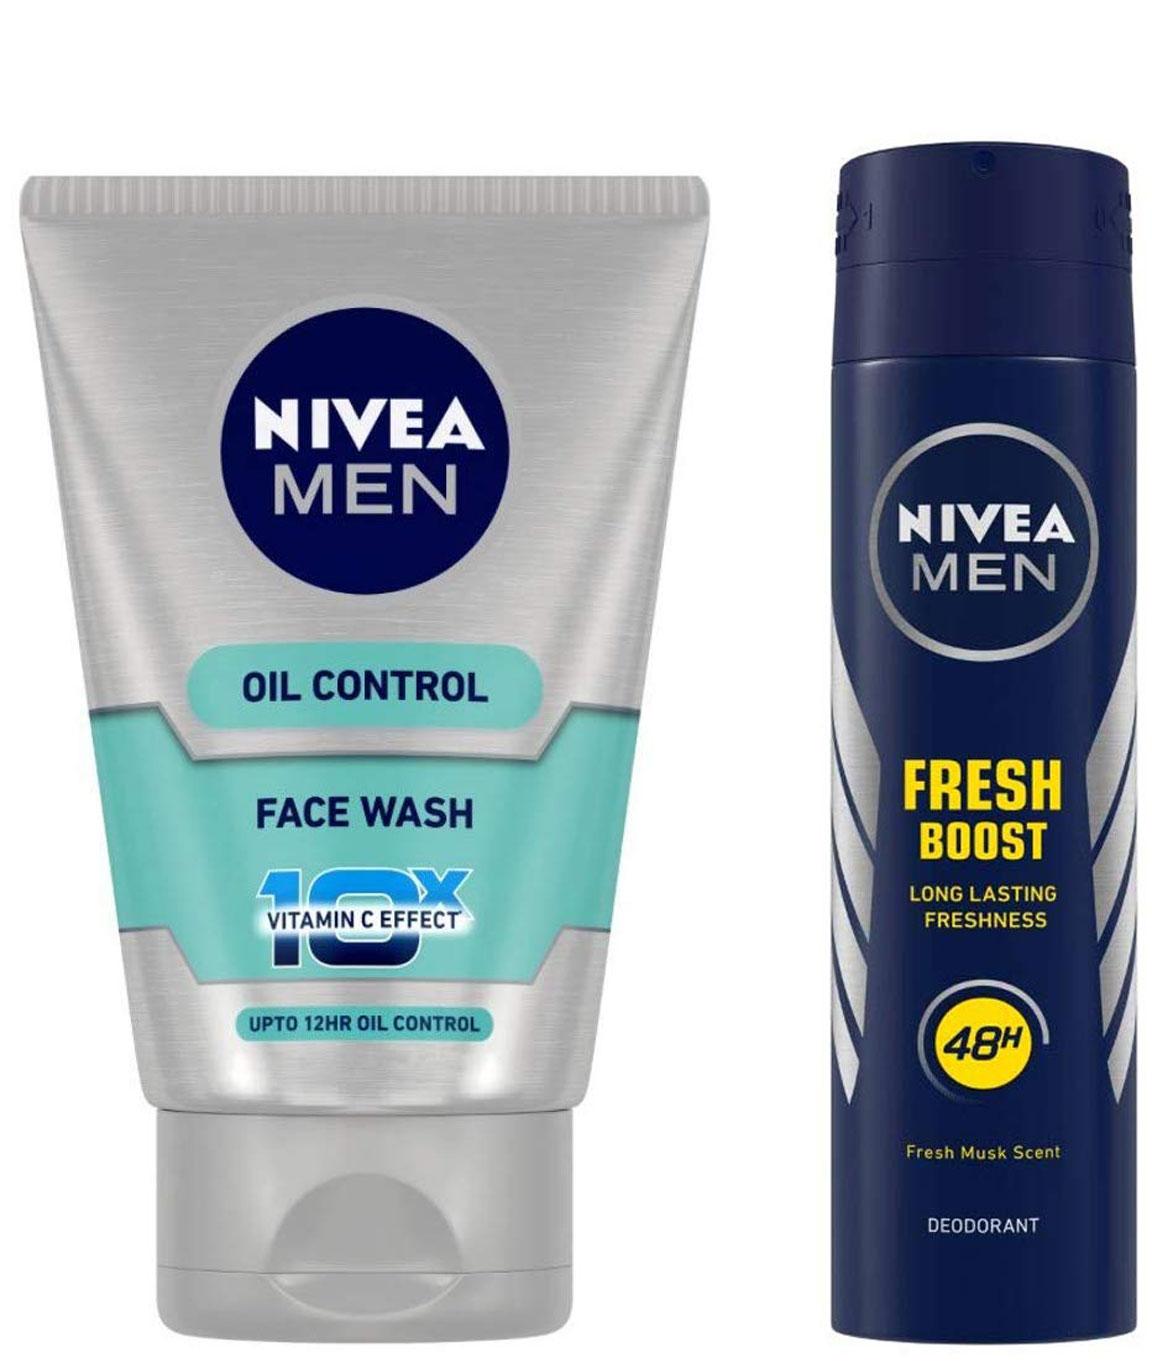 NIVEA MEN Face Wash, Oil Control With Vitamin C, 100ml & MEN Deodorant, Fresh Power Boost, 150ml Combo